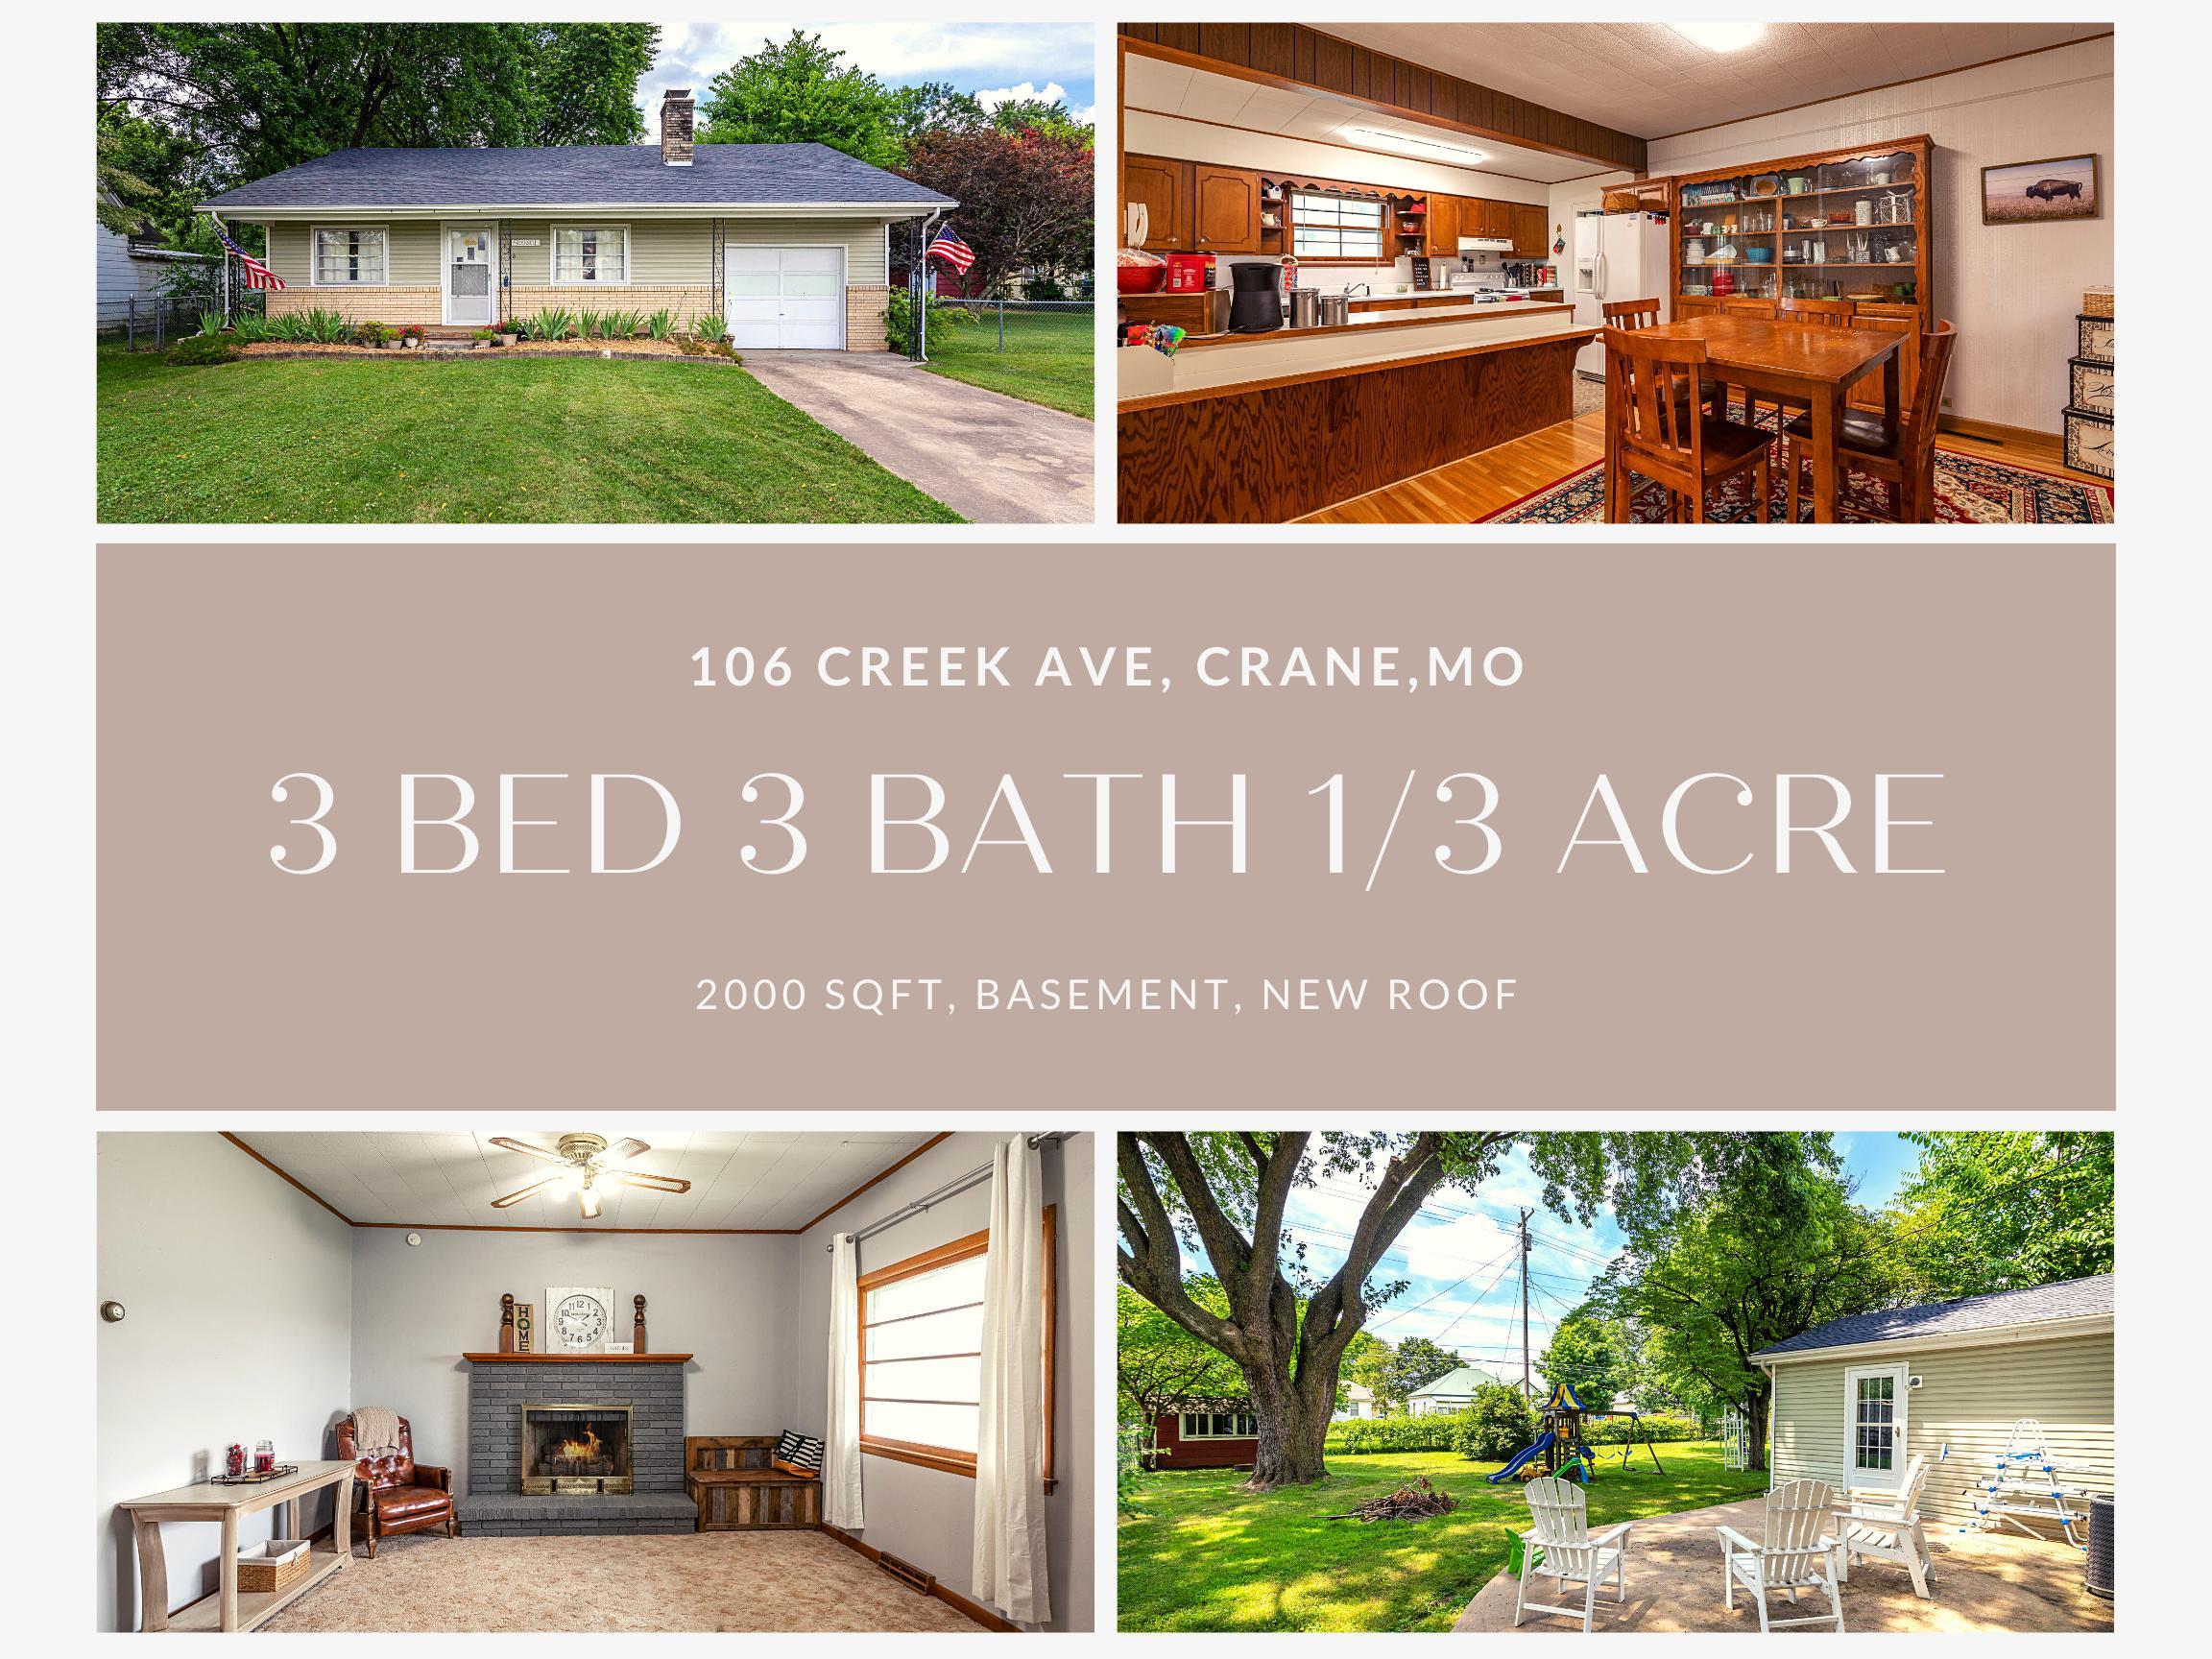 106 Creek Avenue Crane, MO 65633